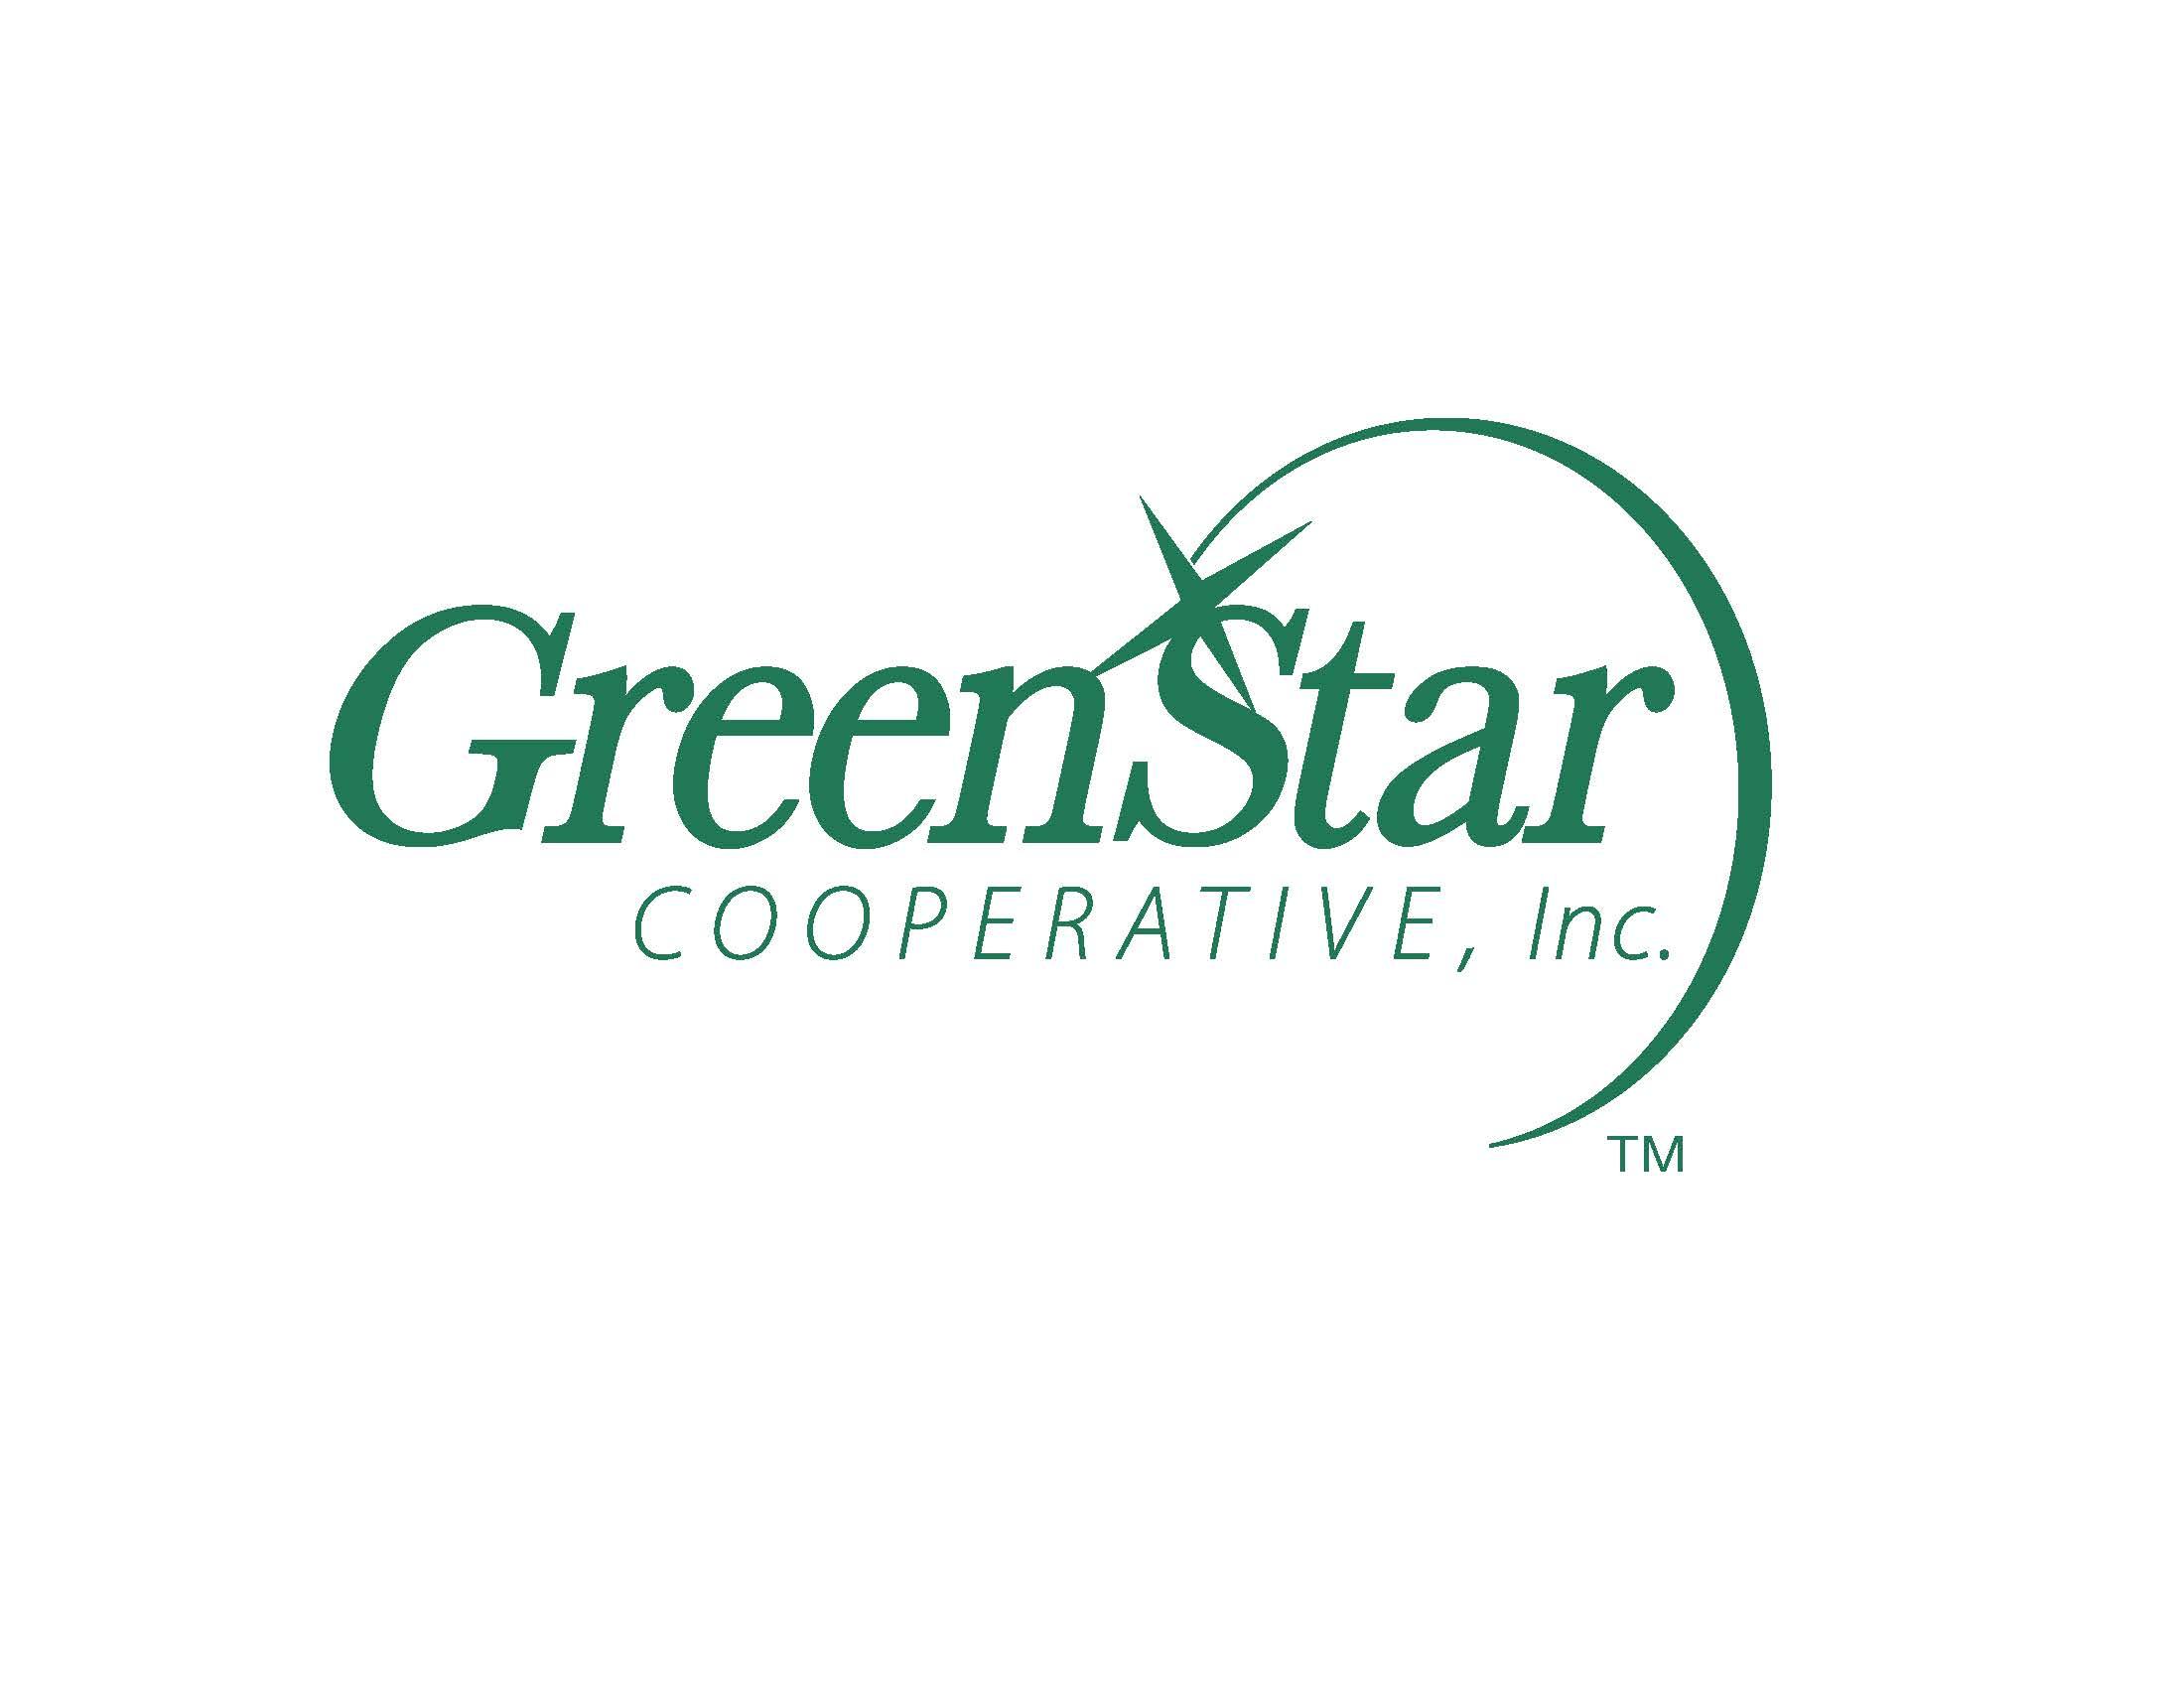 GreenStar Cooperative, Inc. Farm Markets Division